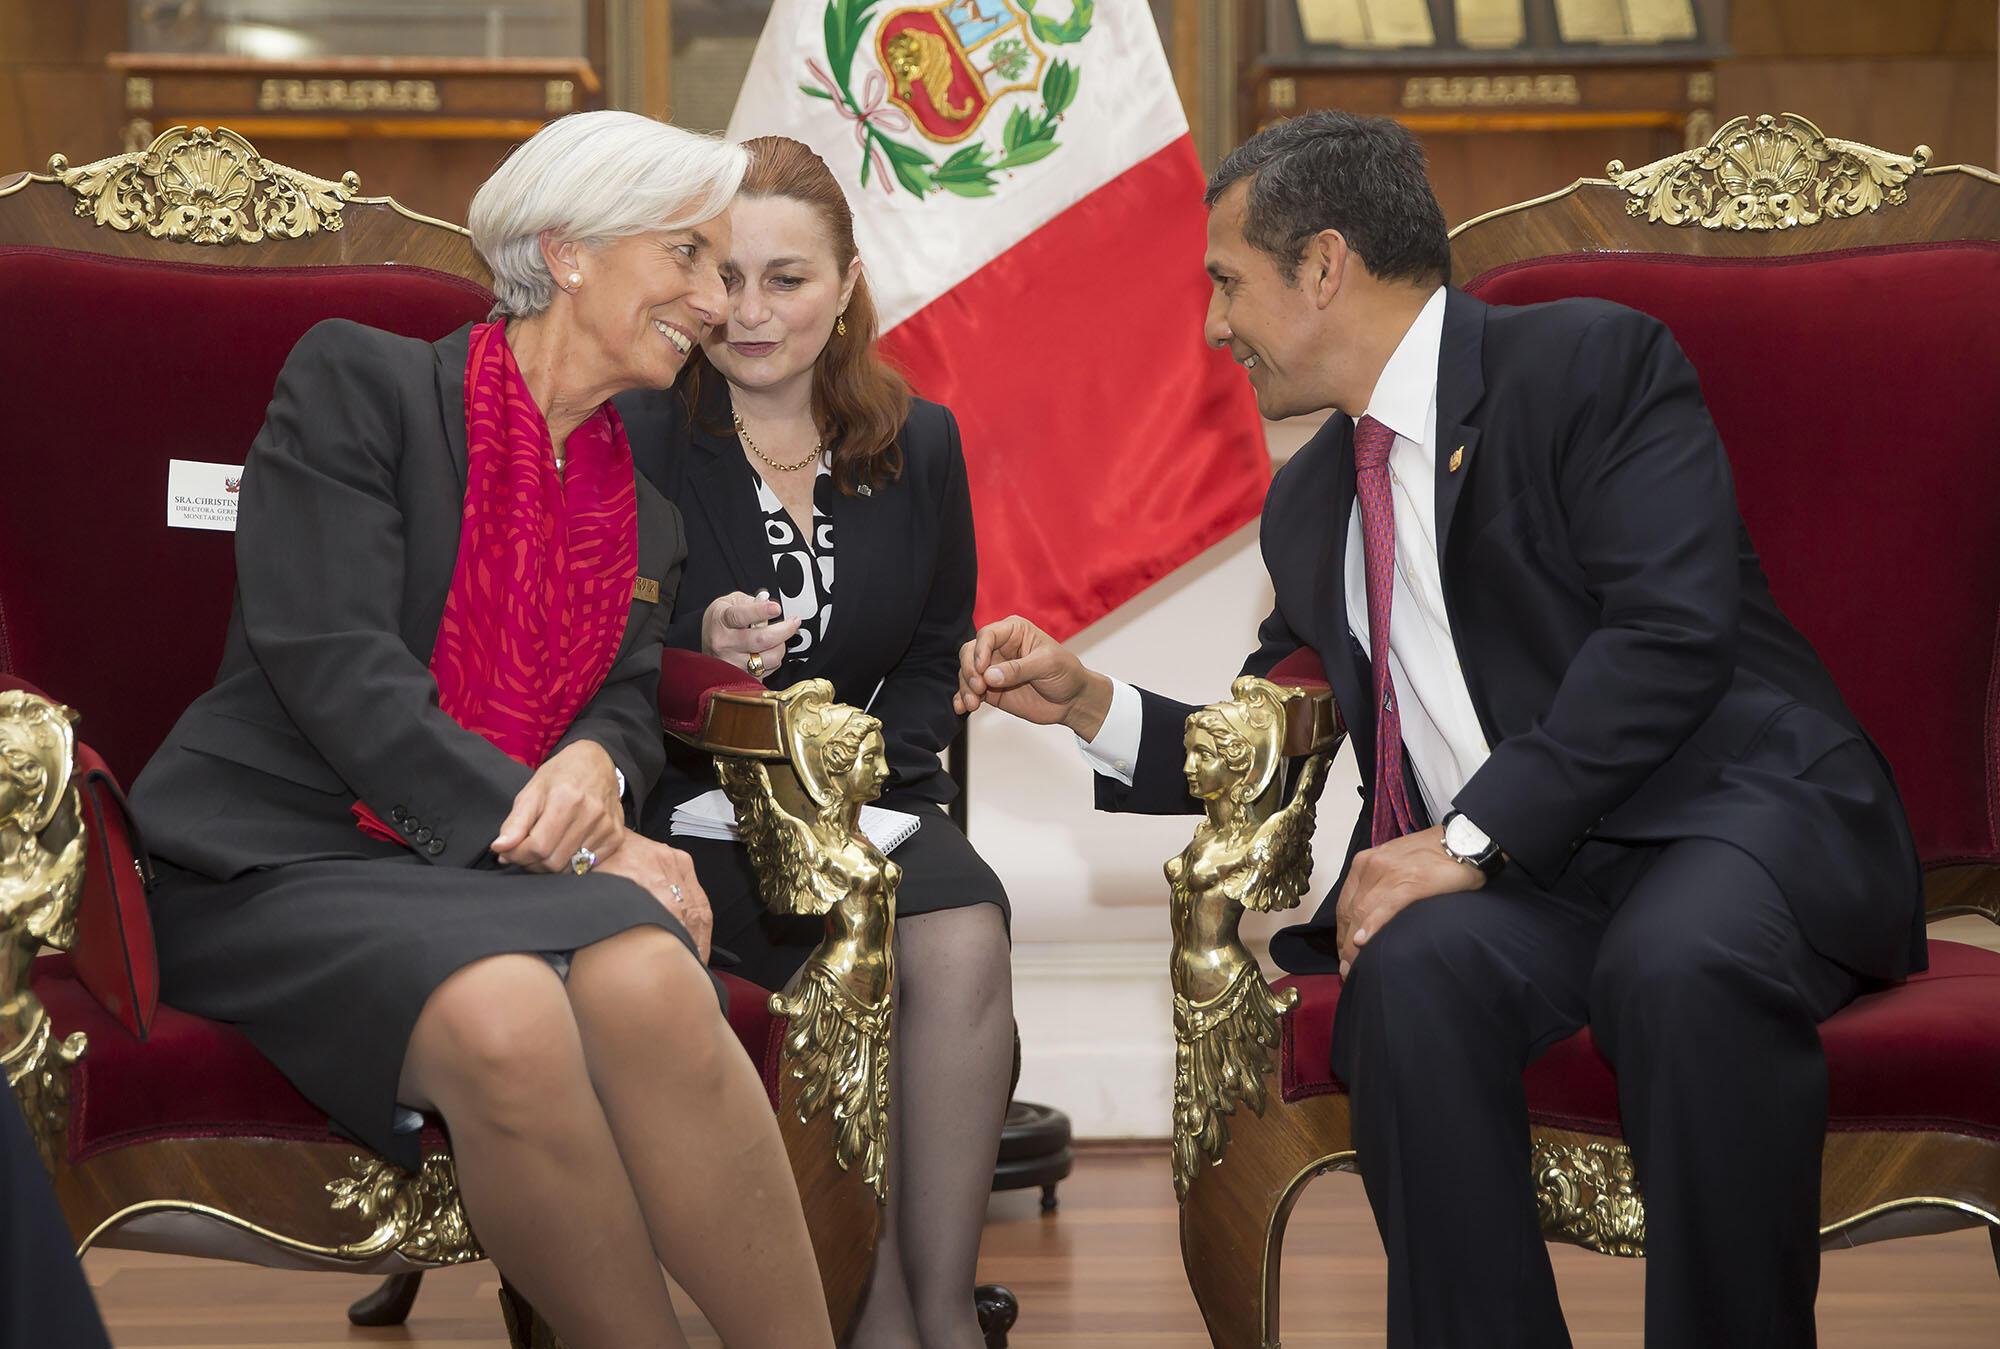 A photo of Peru's president Ollanta Humala meeting with the International Monetary Fund's Christine Lagarde in 2014. (Photo by Stephen Jaffe/IMF Staff.)